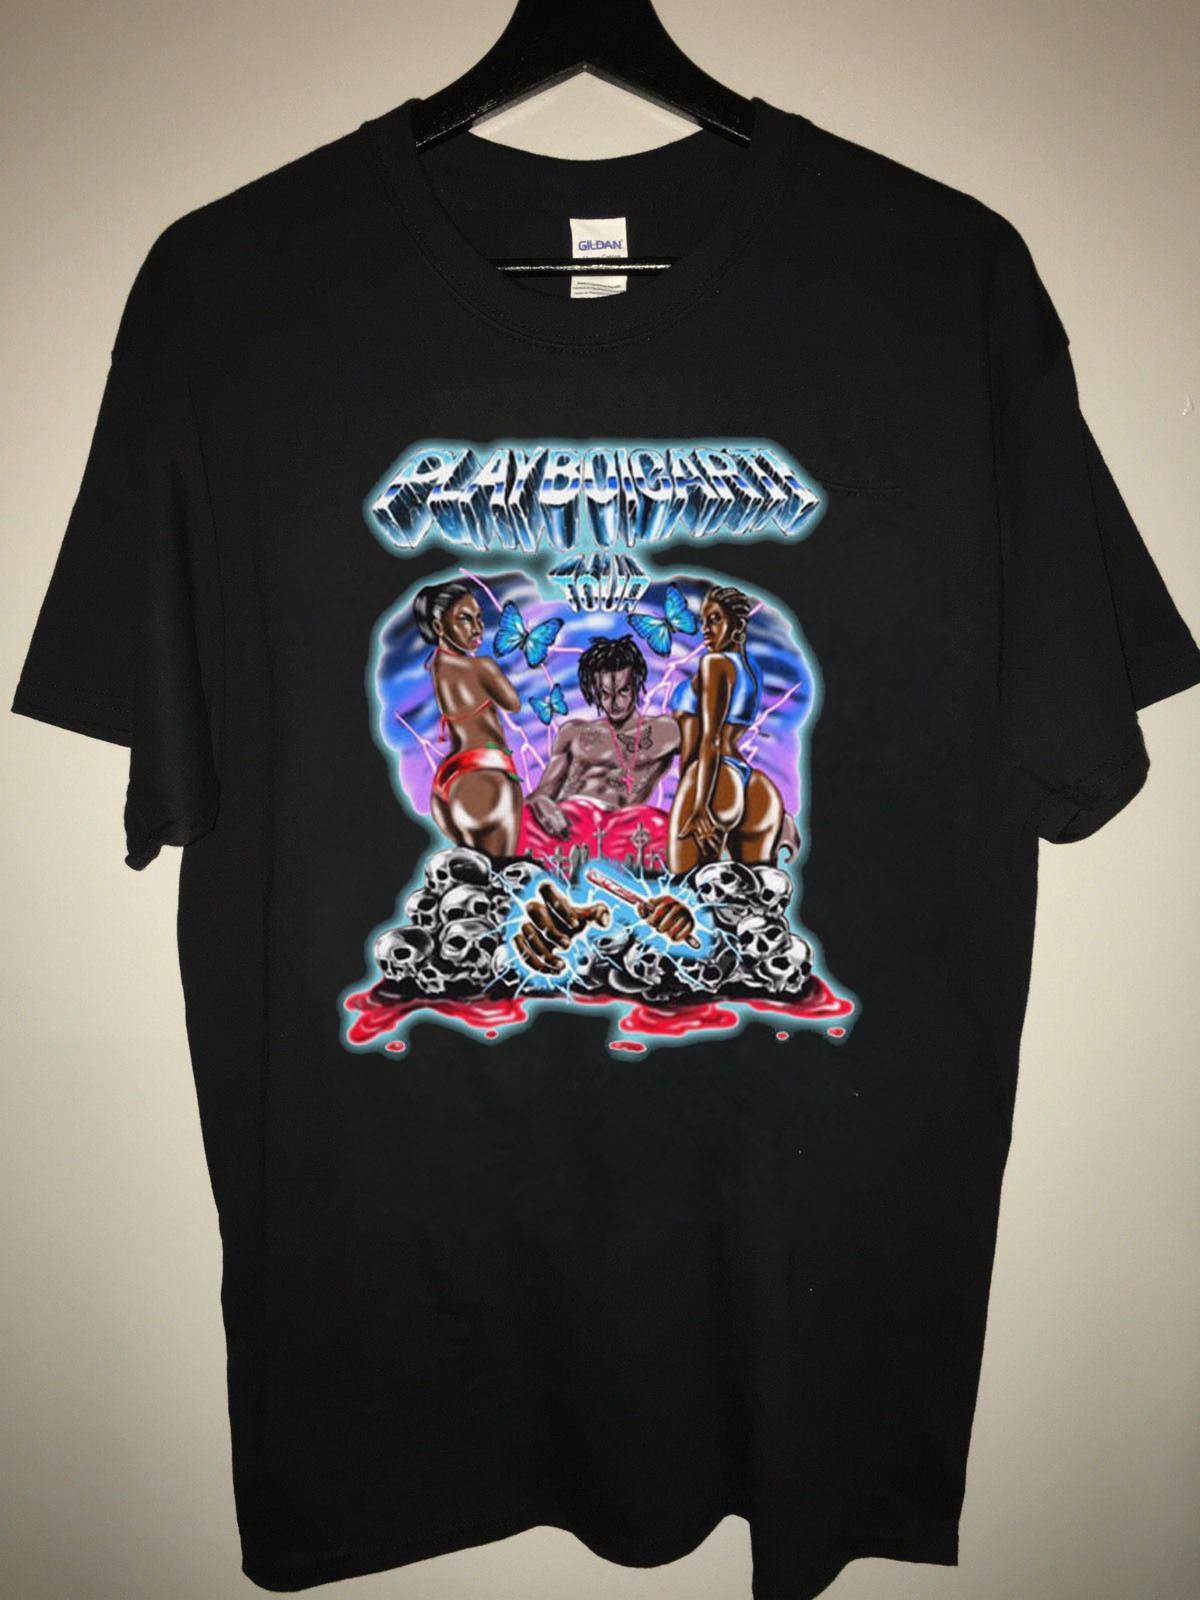 5f2d0241b74 New Playboi Carti Tour Magnolia Rap Tee Hip Hop Best Designer T Shirts  Funny Team Shirts From Grabmybits